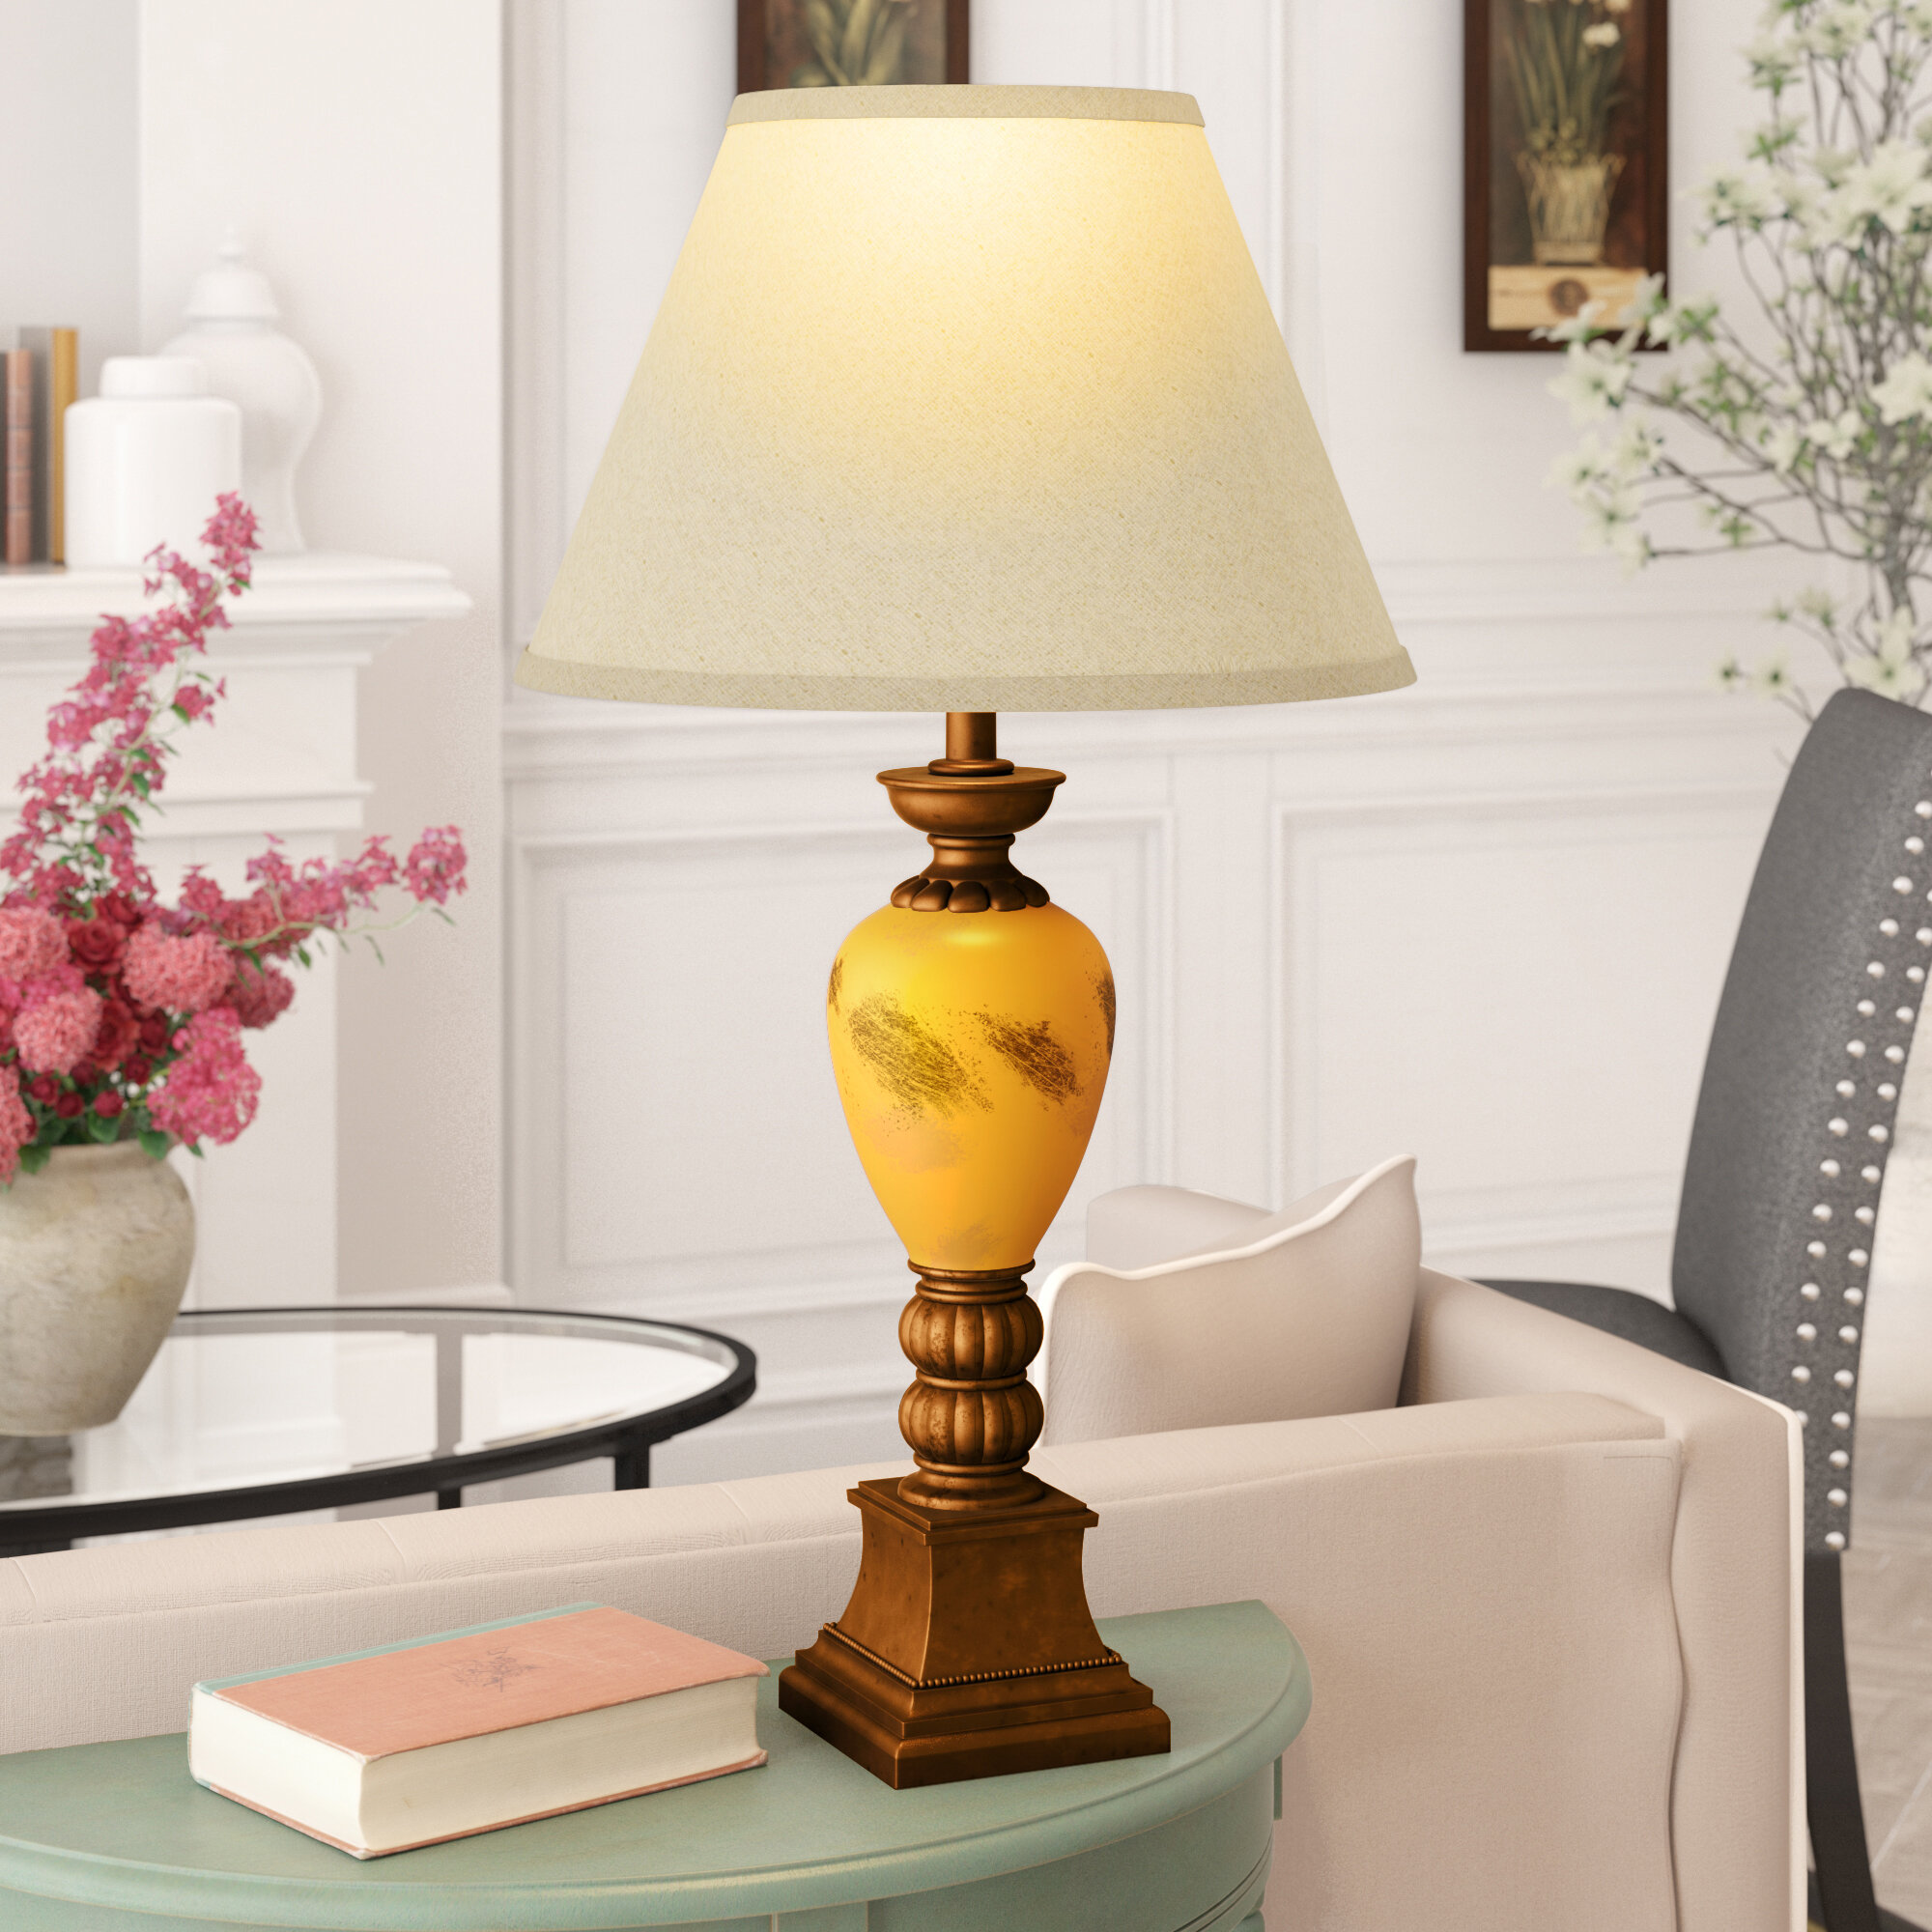 Astoria grand maclin traditional 29 table lamp wayfair